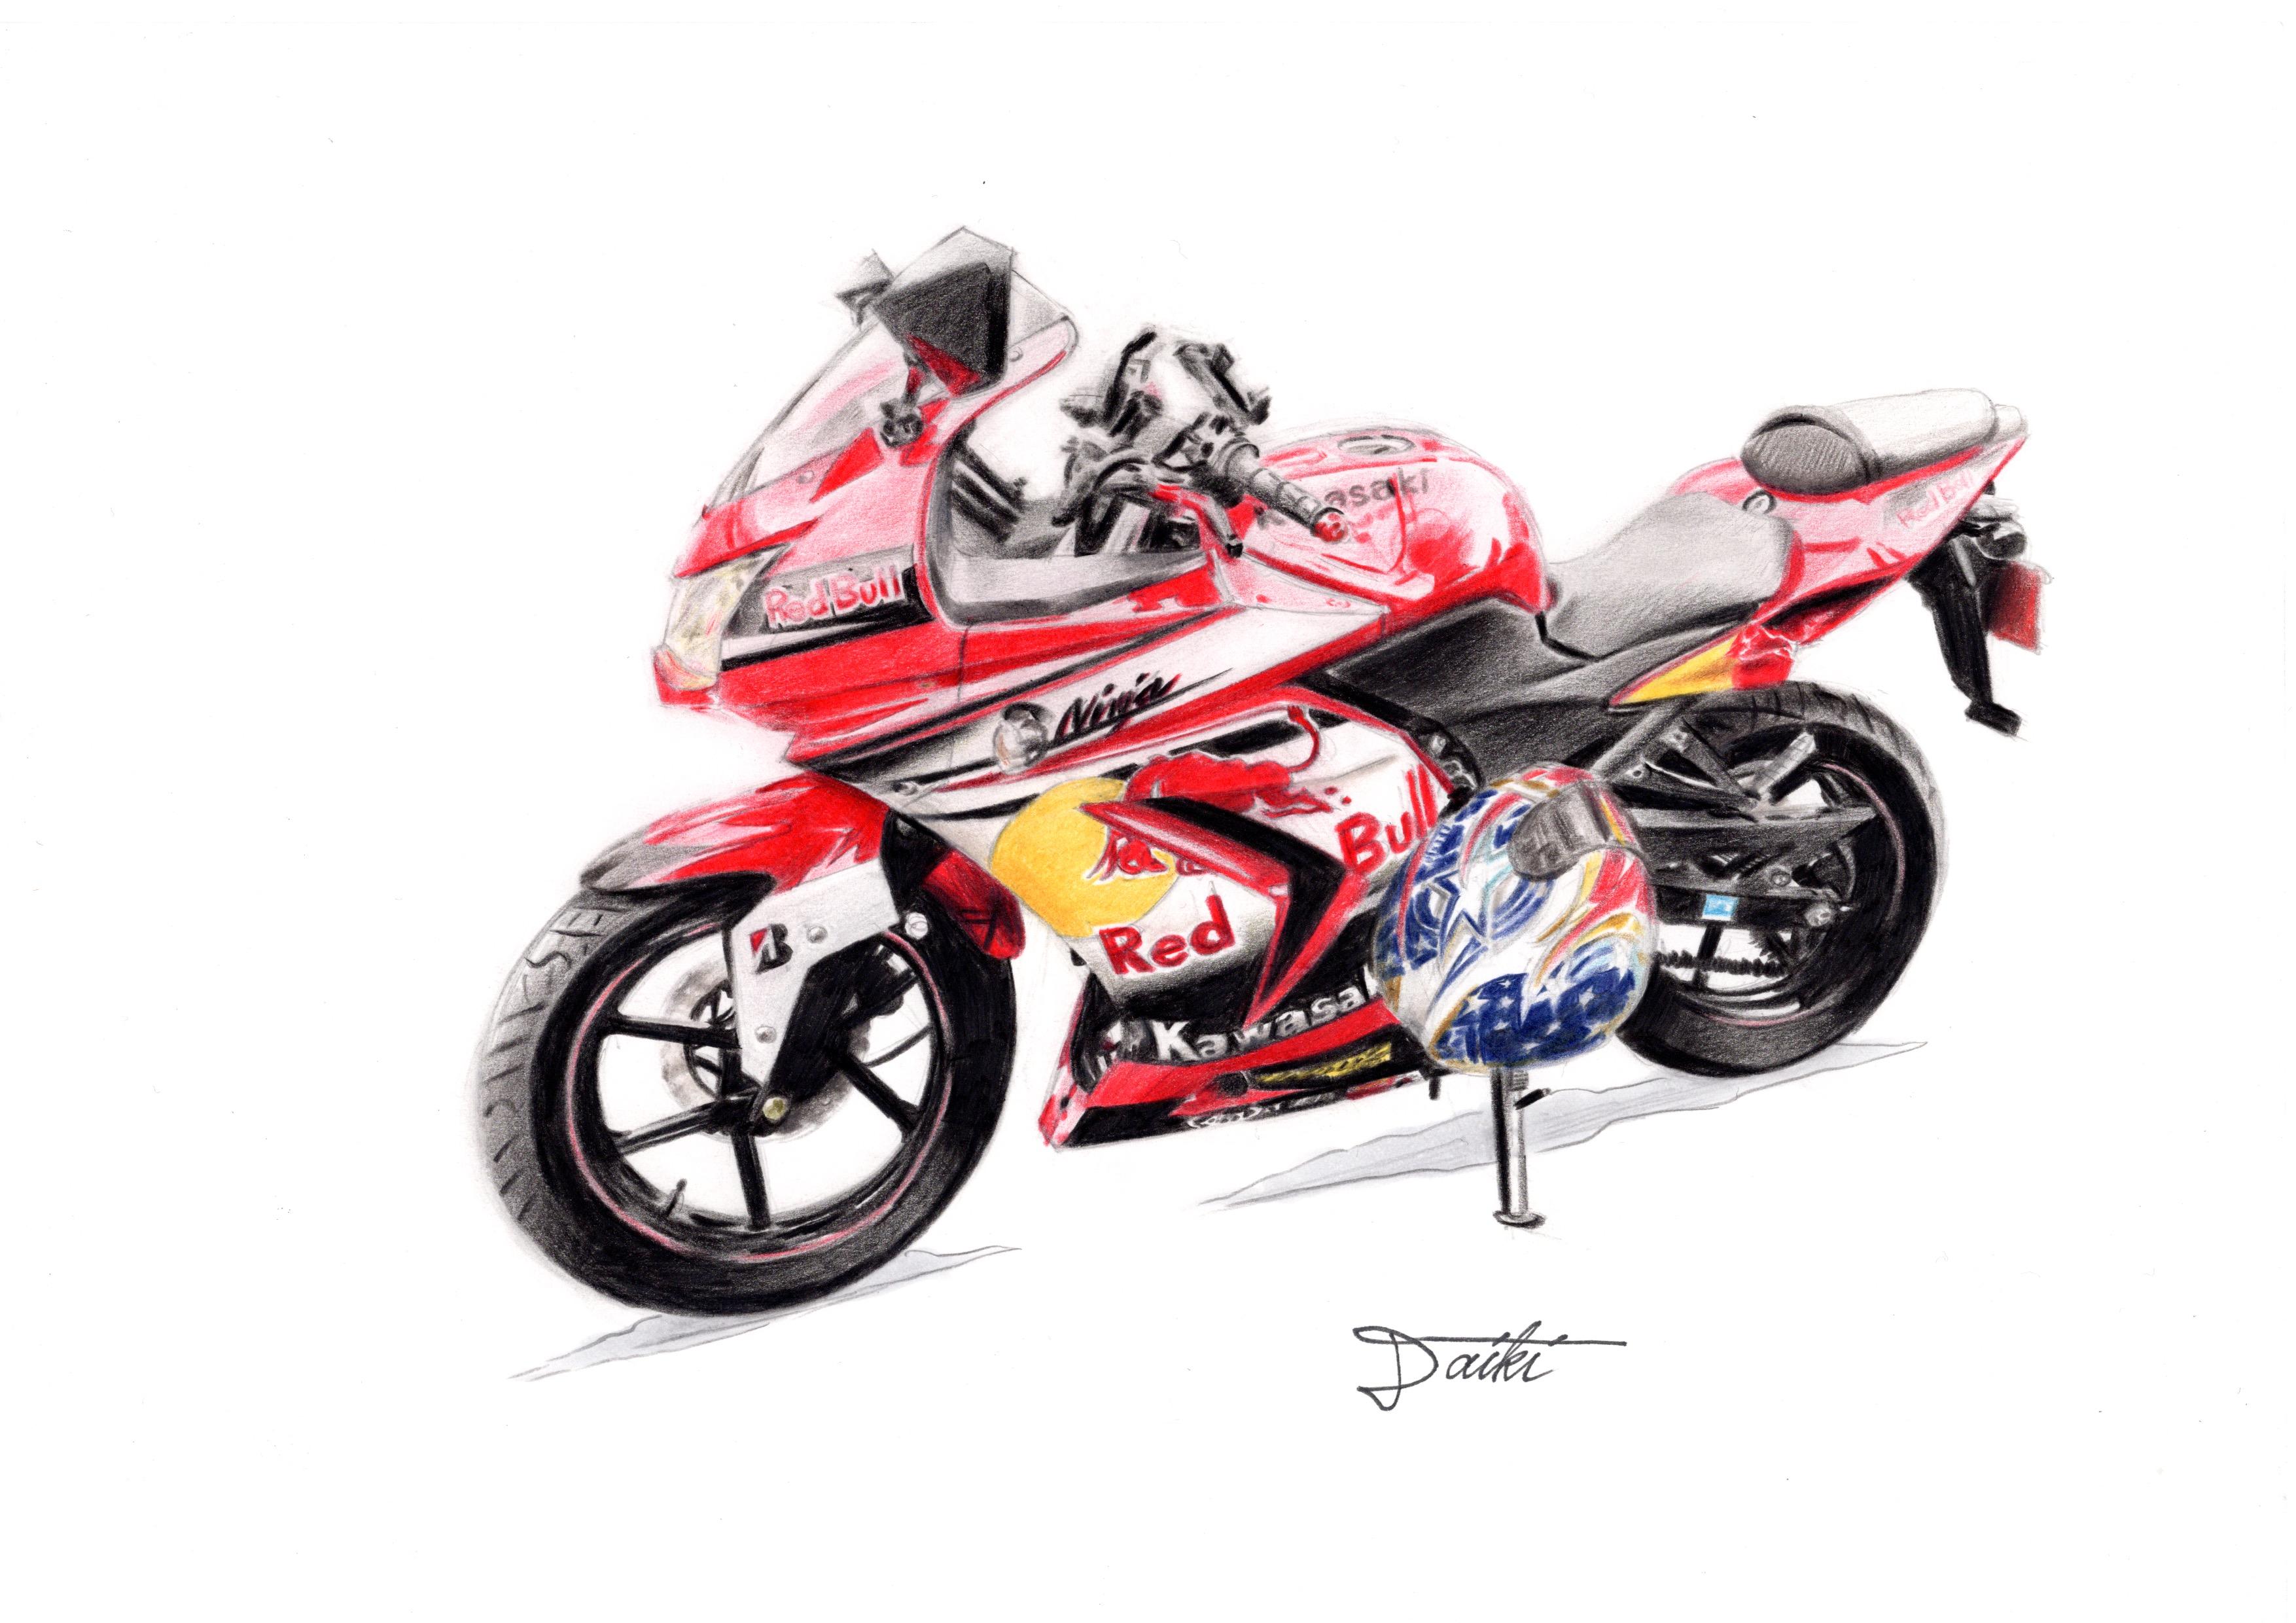 Kawasaki Ninja250 色鉛筆イラスト